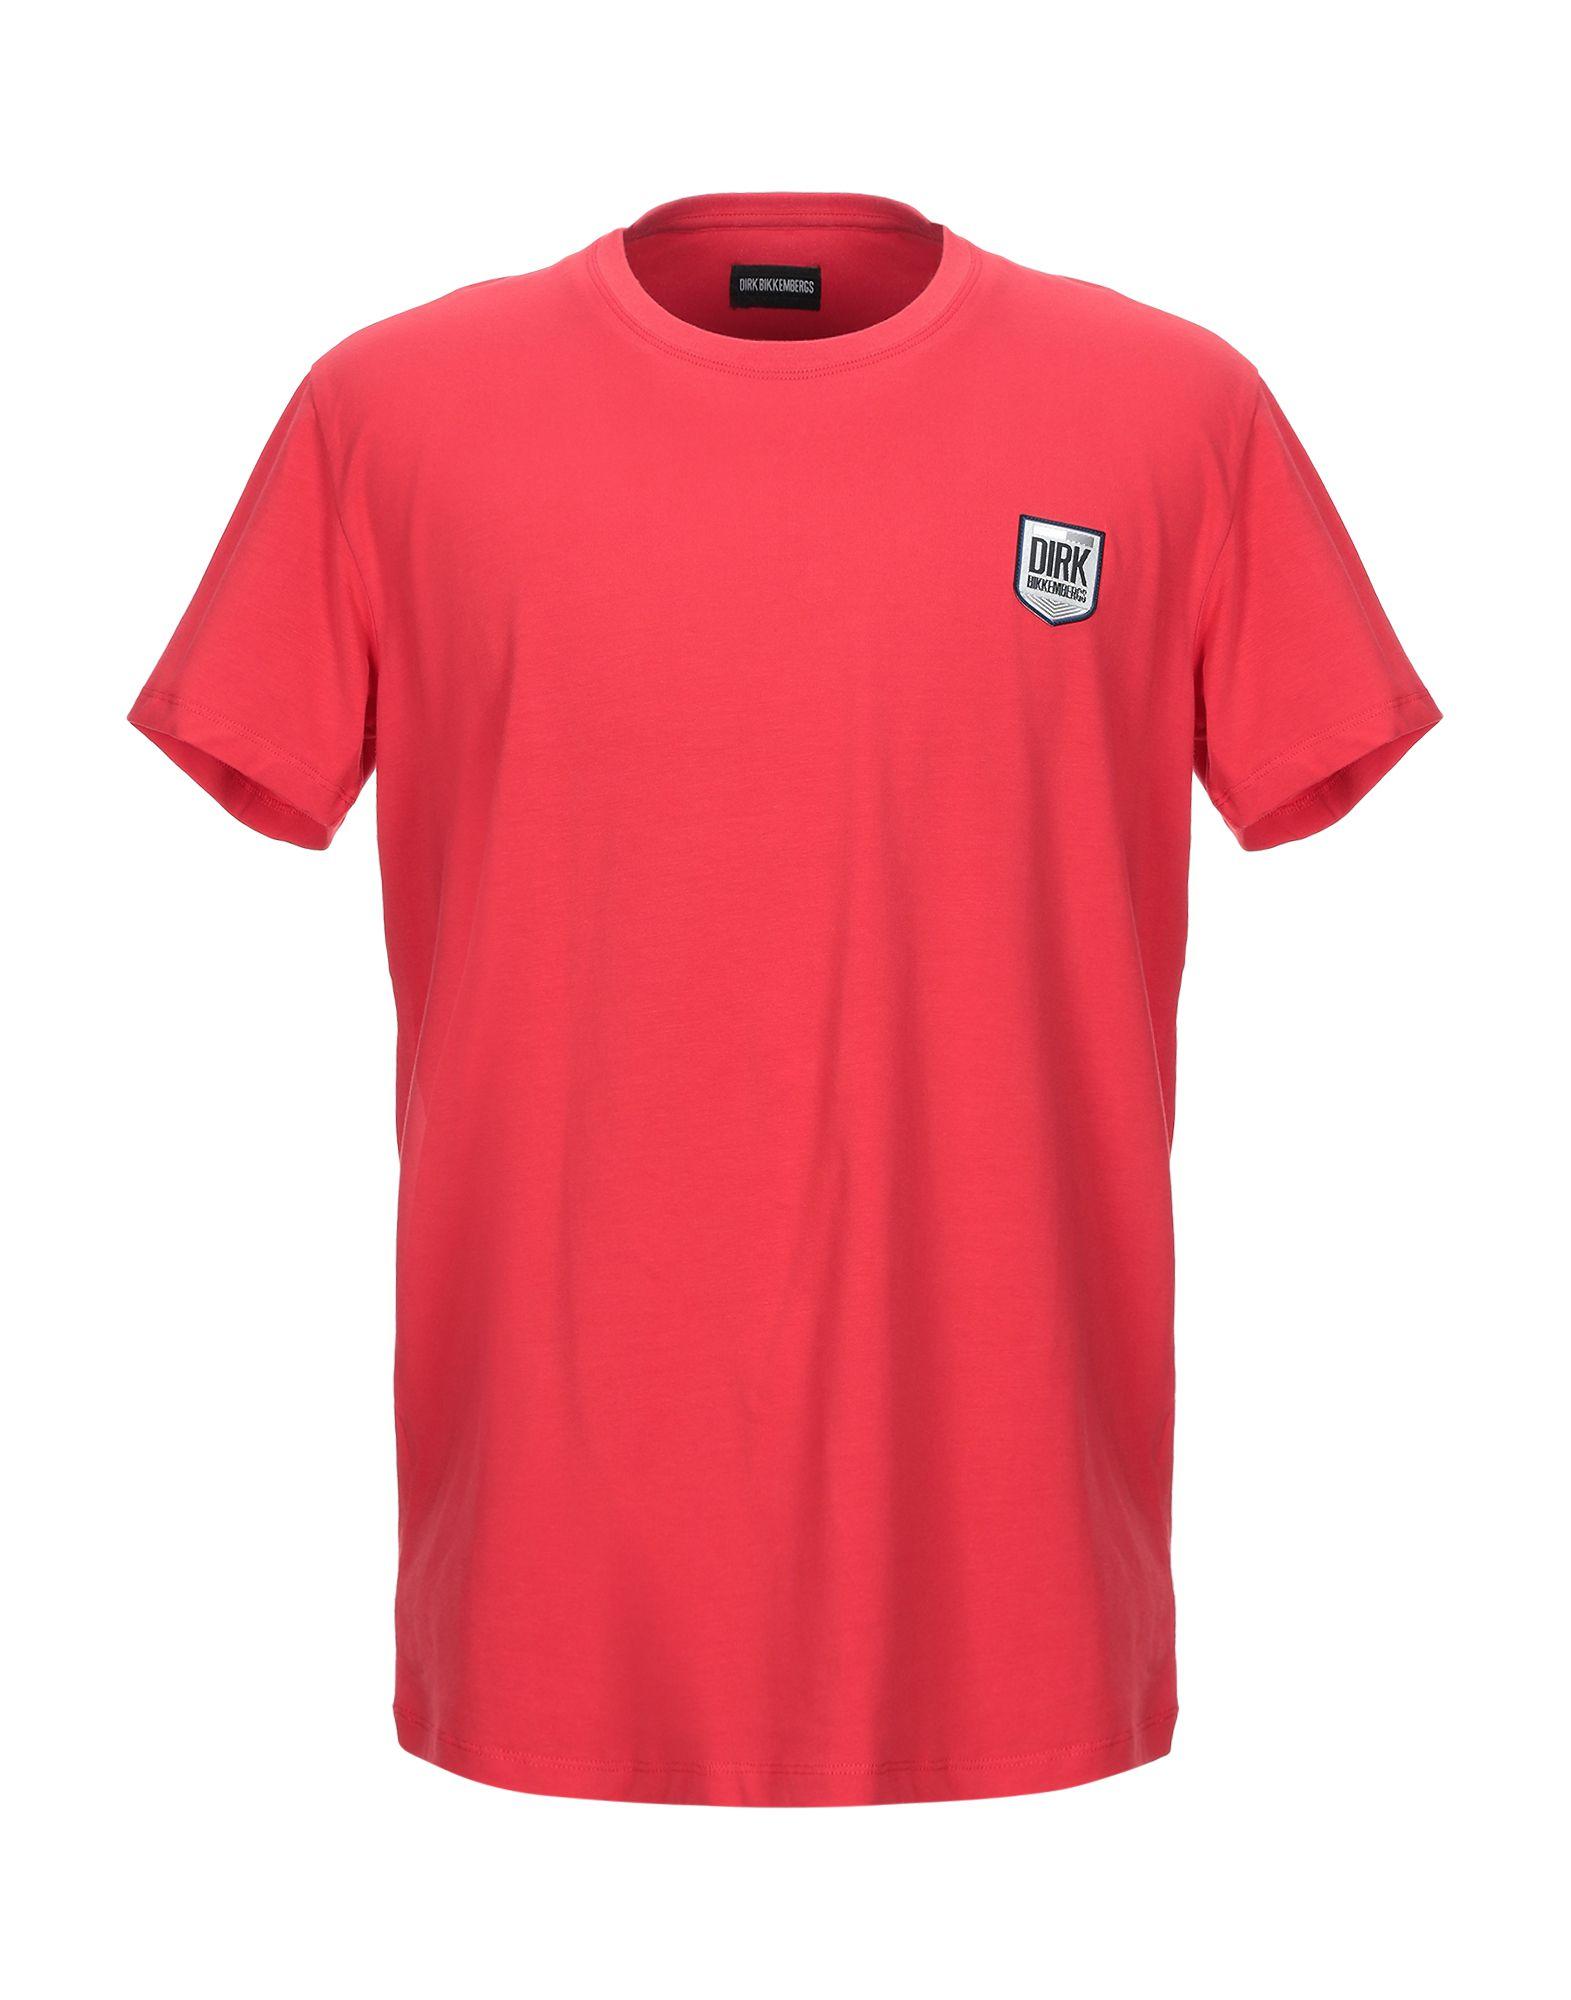 DIRK BIKKEMBERGS Футболка футболка с длинным рукавом dirk bikkembergs